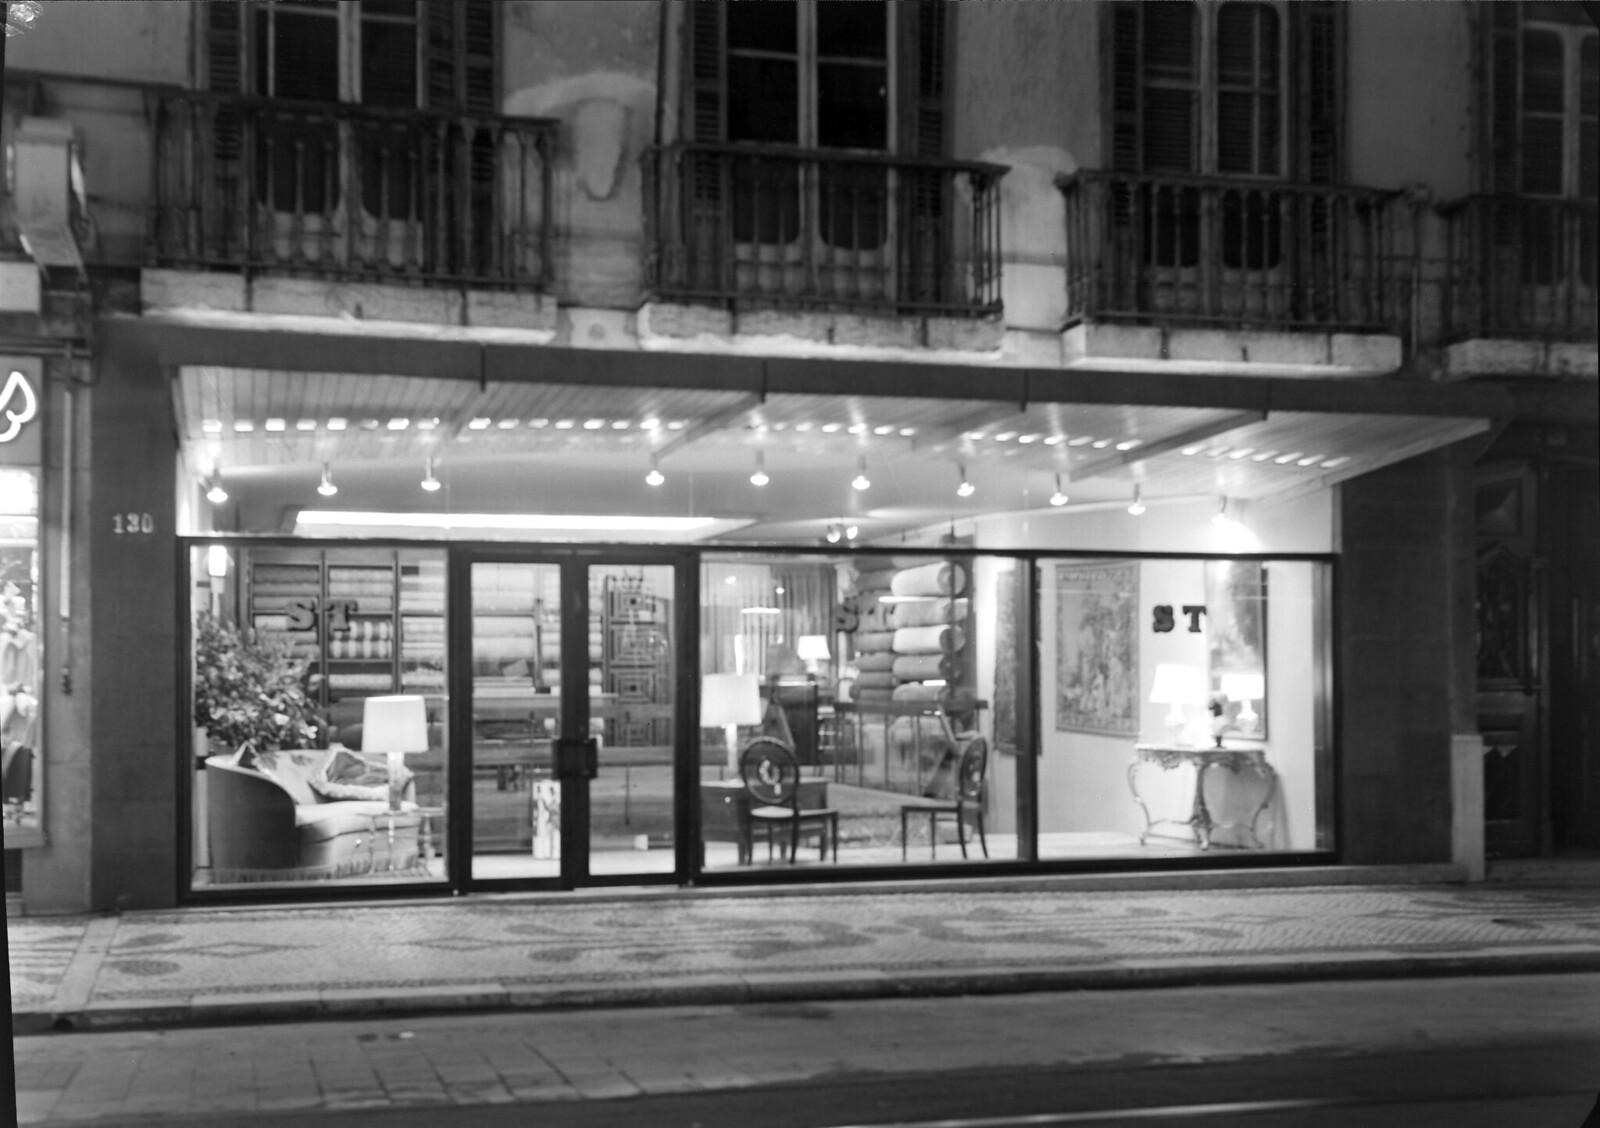 S.T. — Sociedade de Tapeçarias Lda., R. Augusta. Projecto do arquitecto Conceiçao Silva (H. Novais, 196...)